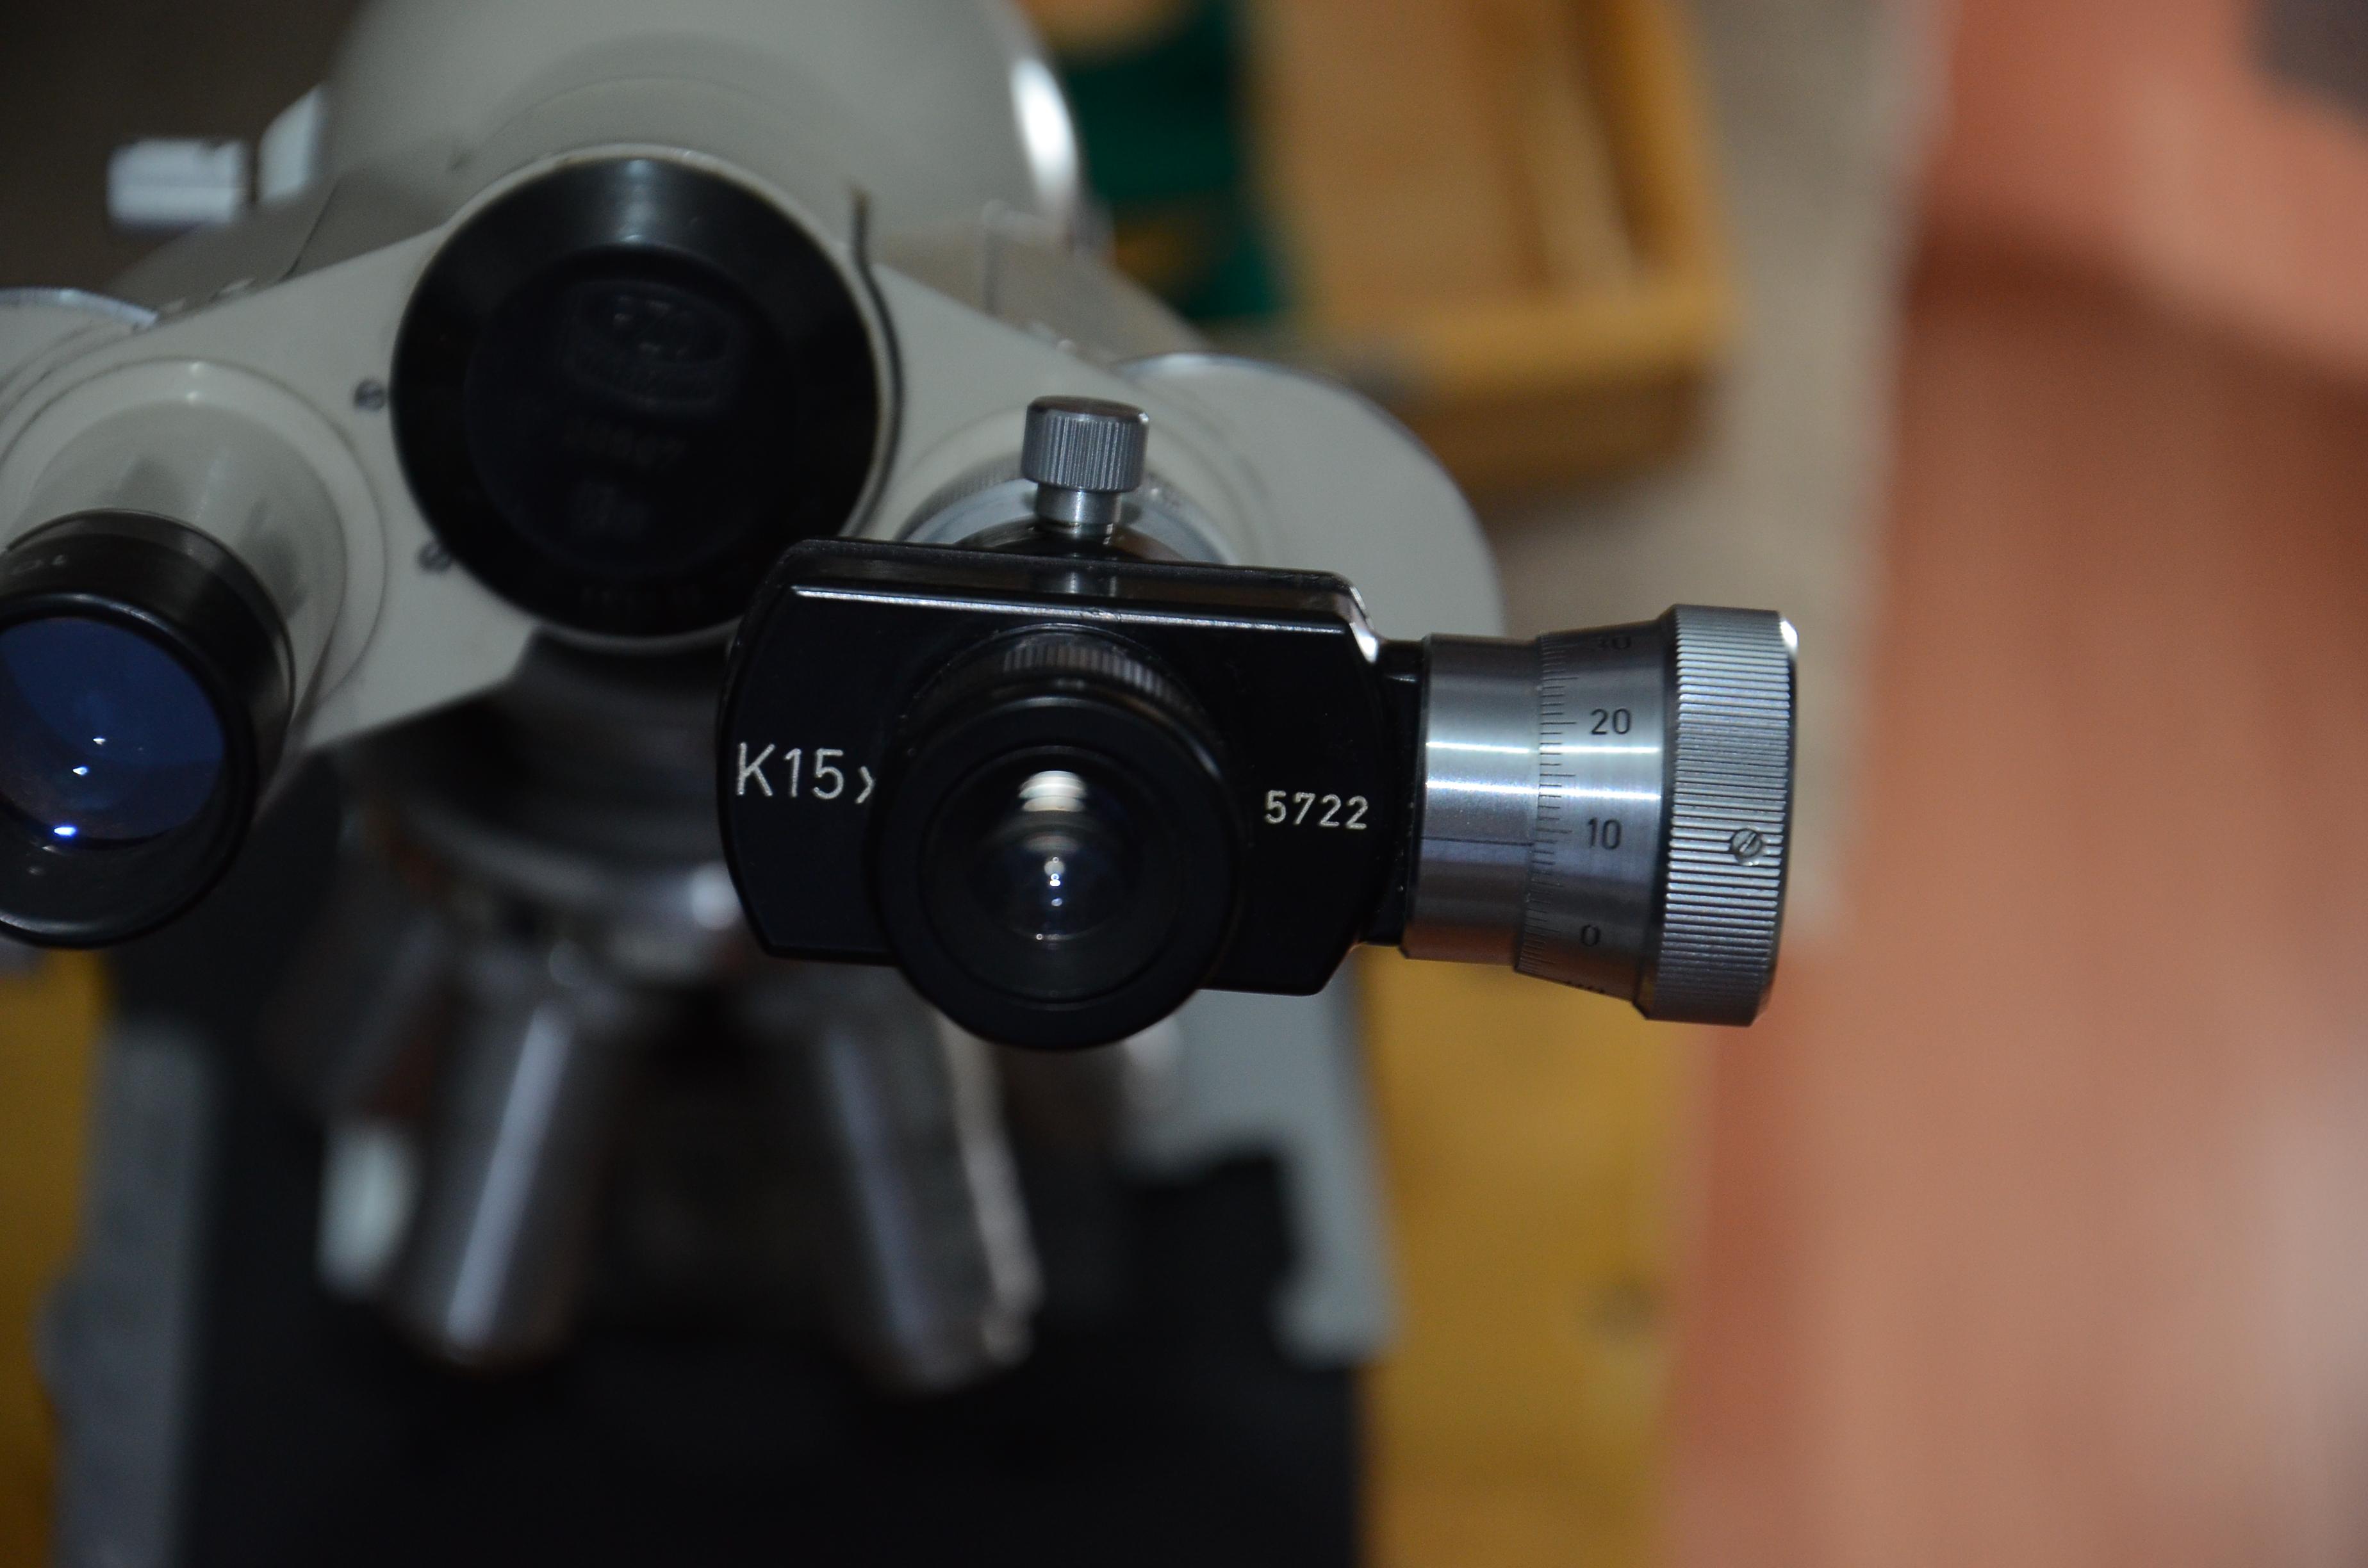 Микрометрический окуляр OK-15-КМ